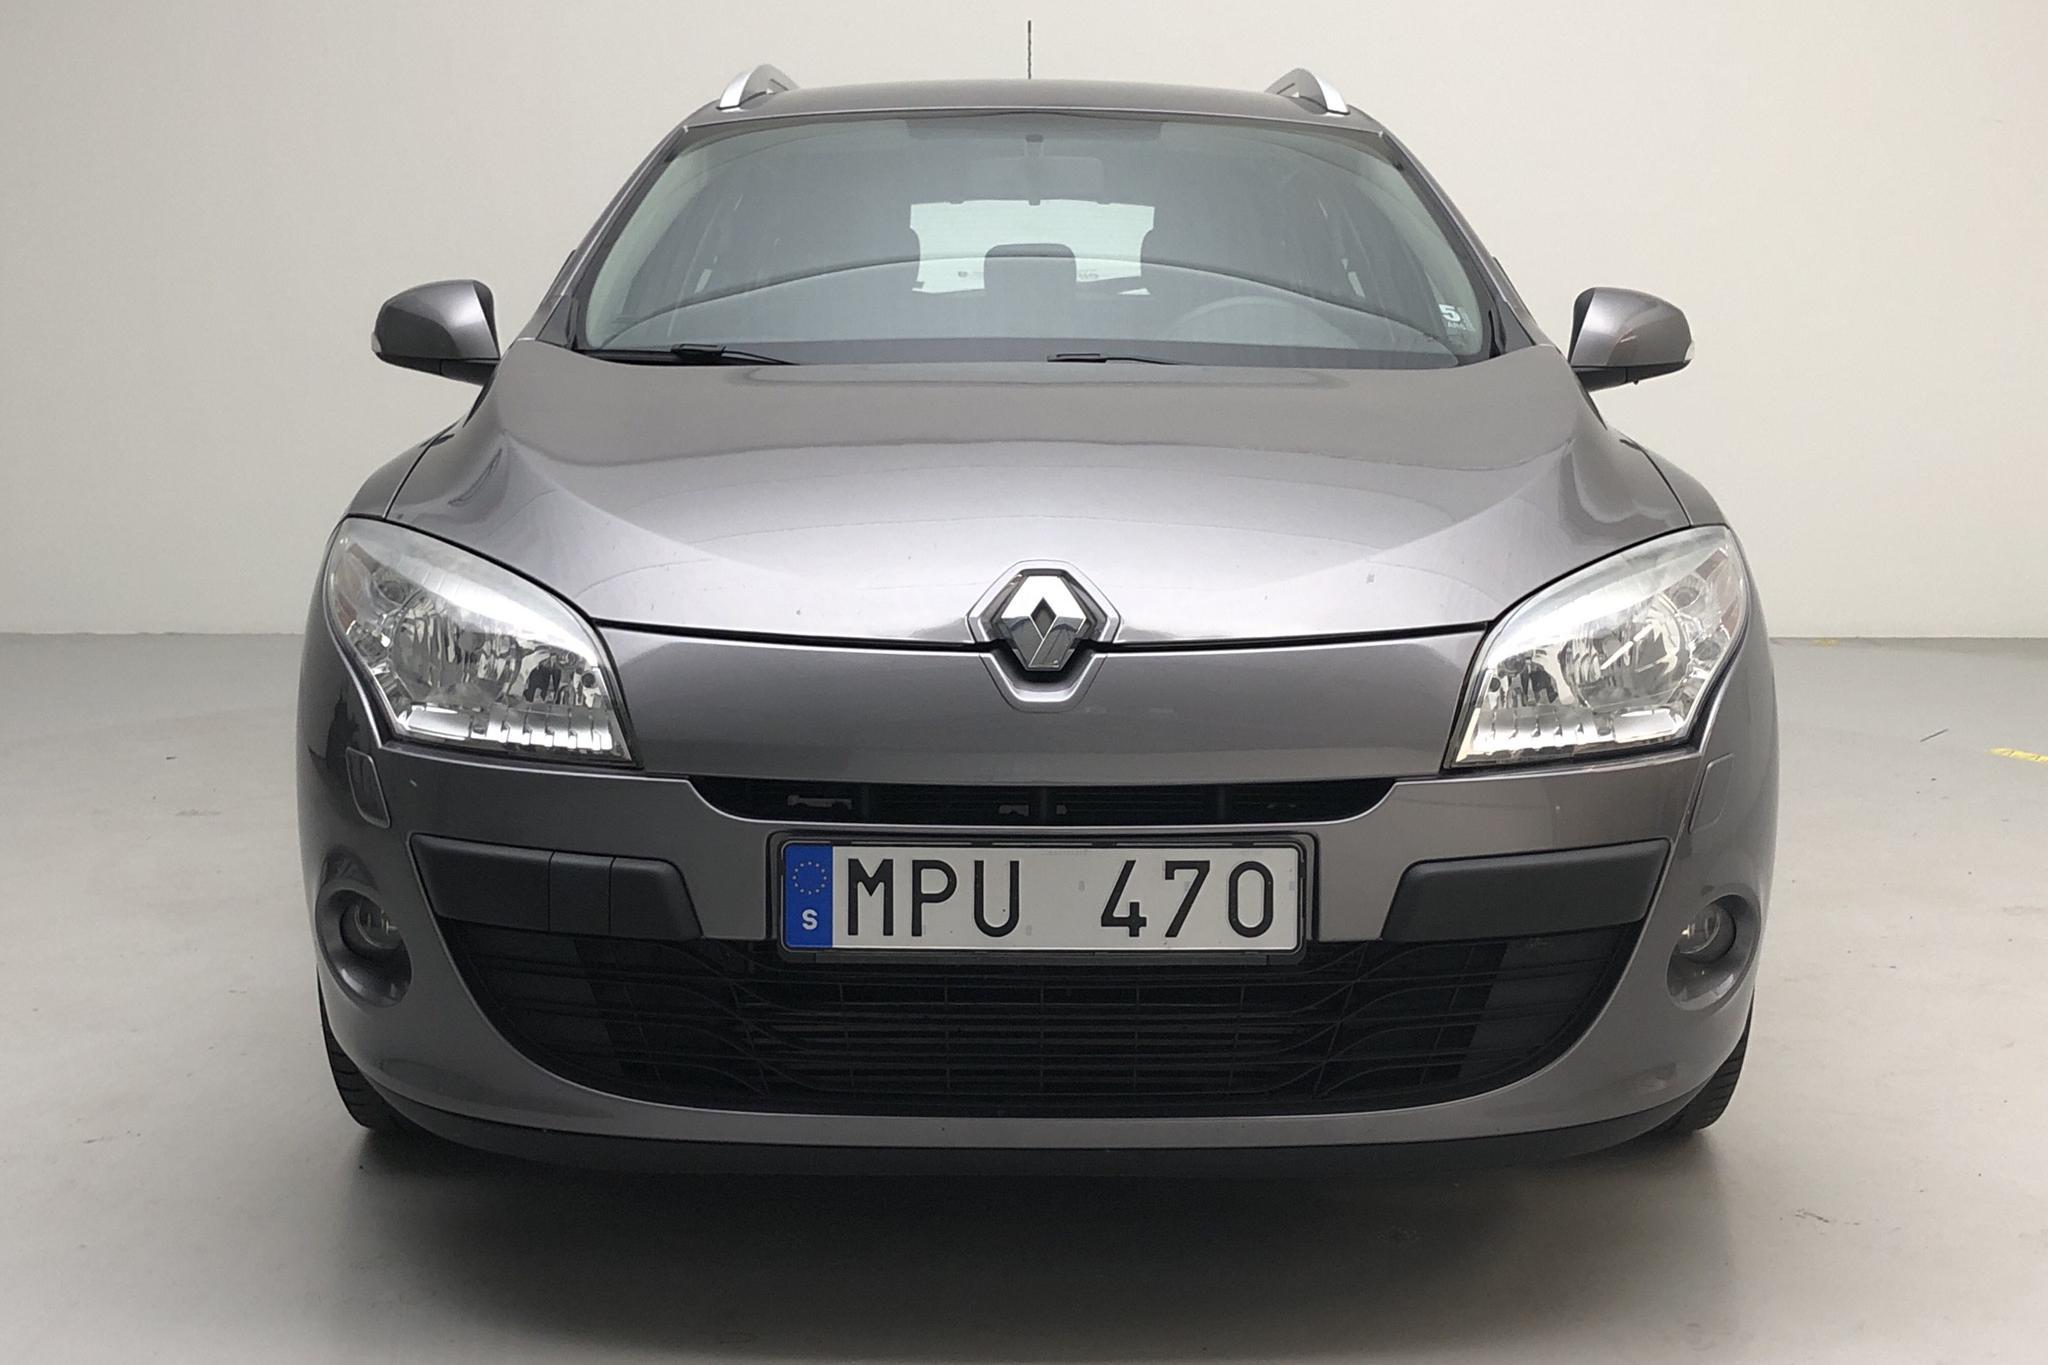 Renault Mégane Phas III 1.5 dCi Sports Tourer (110hk) - 7 477 mil - Manuell - grå - 2011